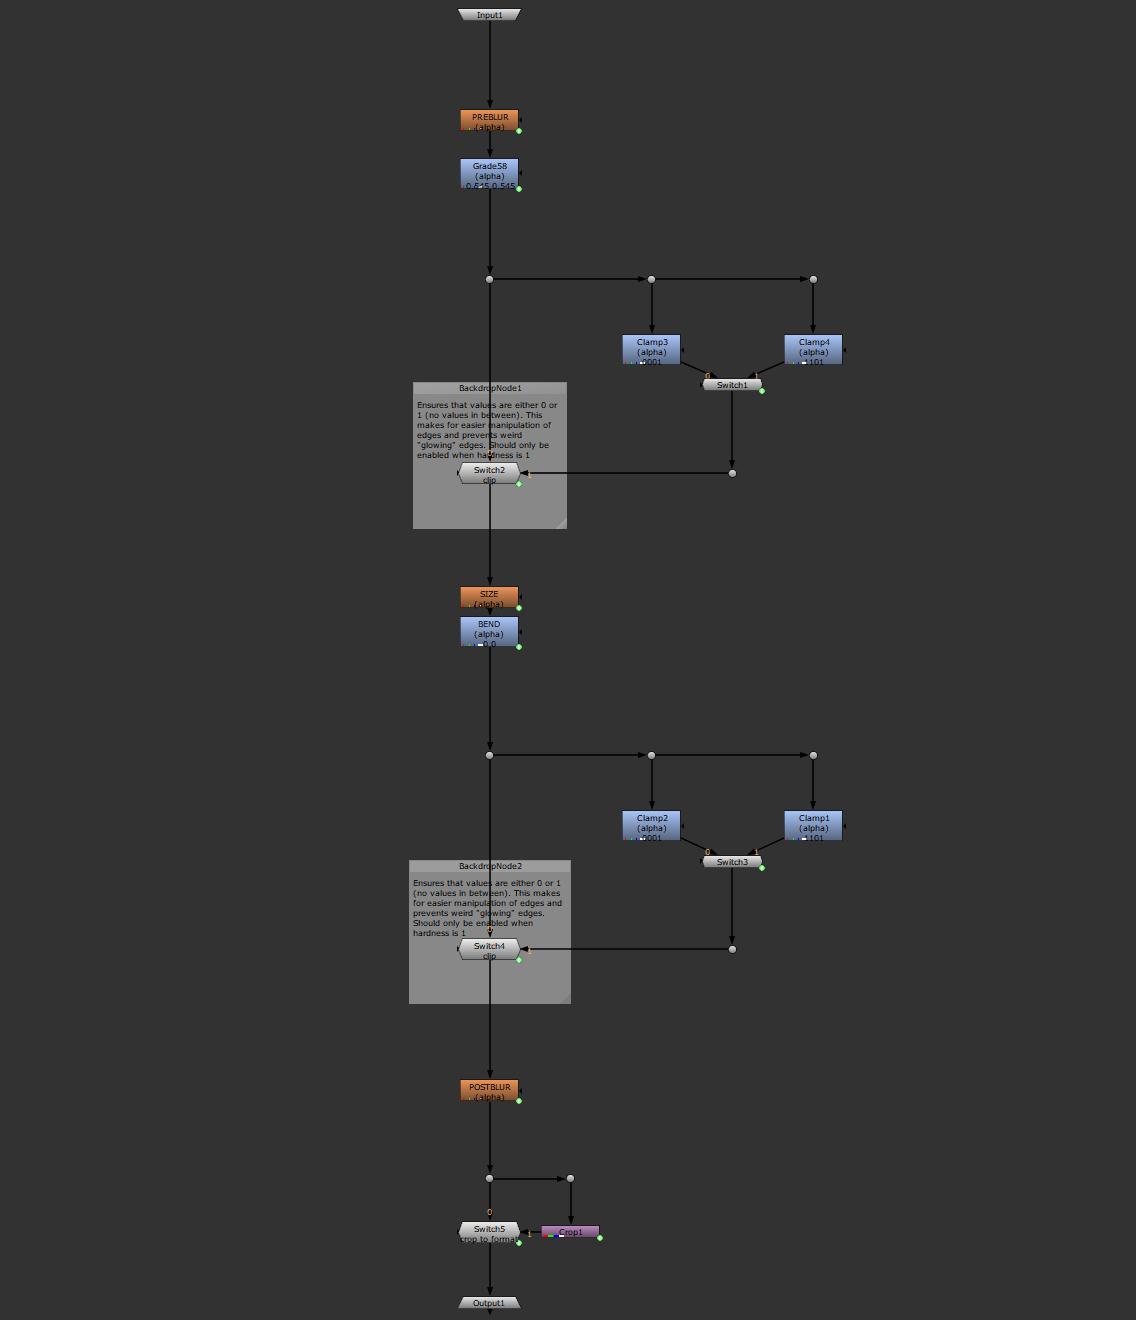 alphaBender v1.0 nodegraph